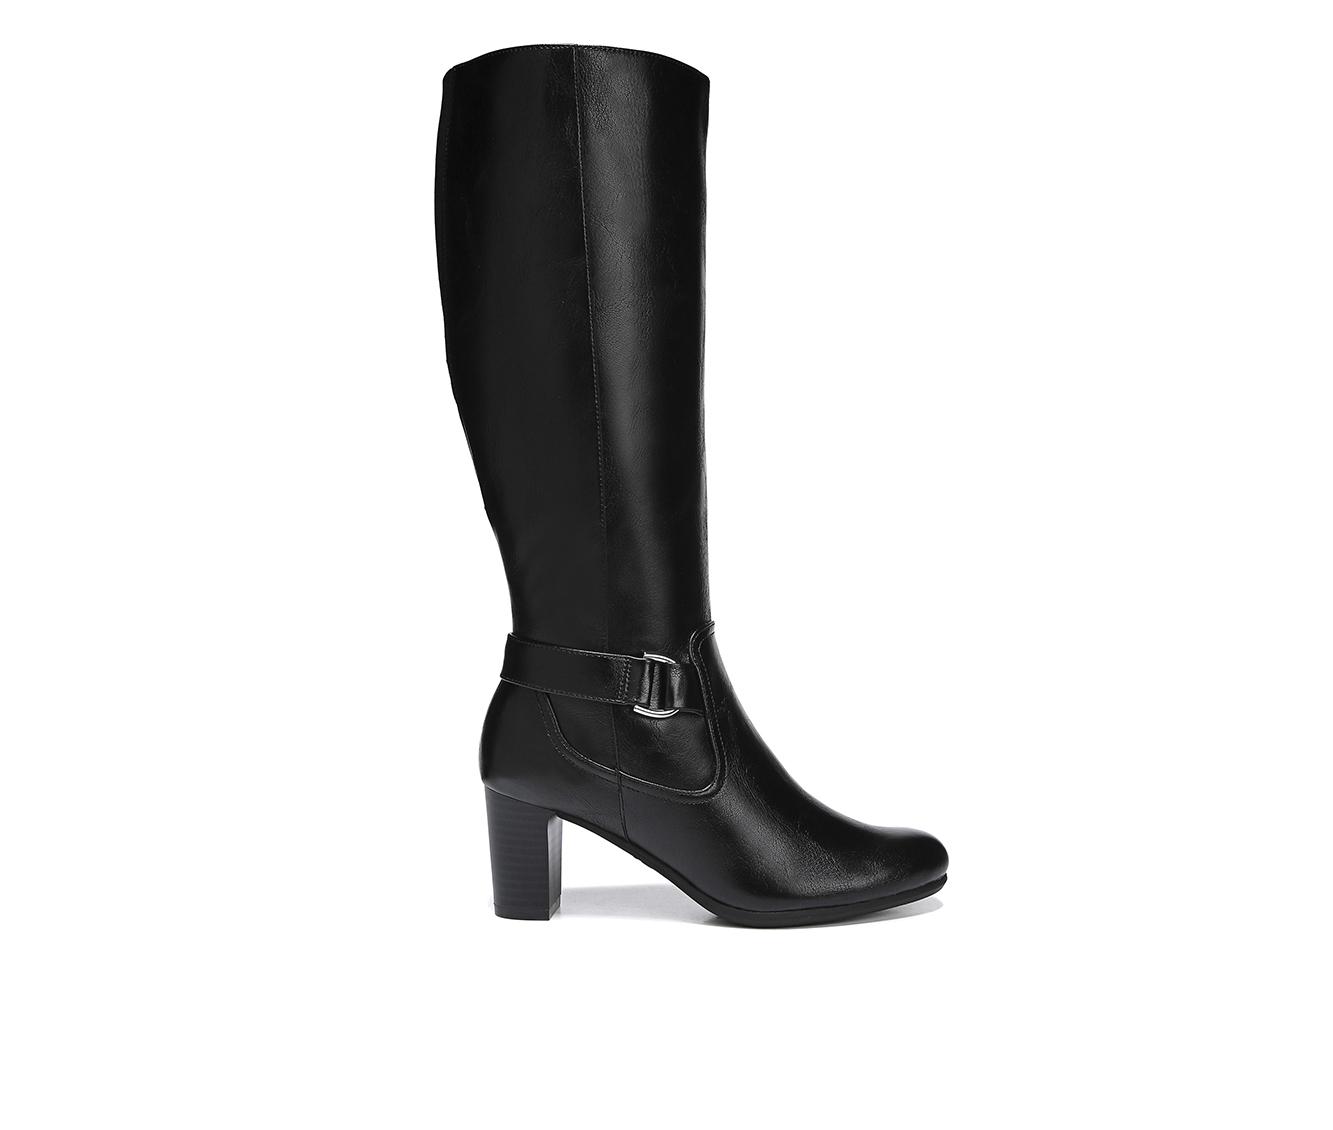 LifeStride Marta Women's Boots (Black - Faux Leather)